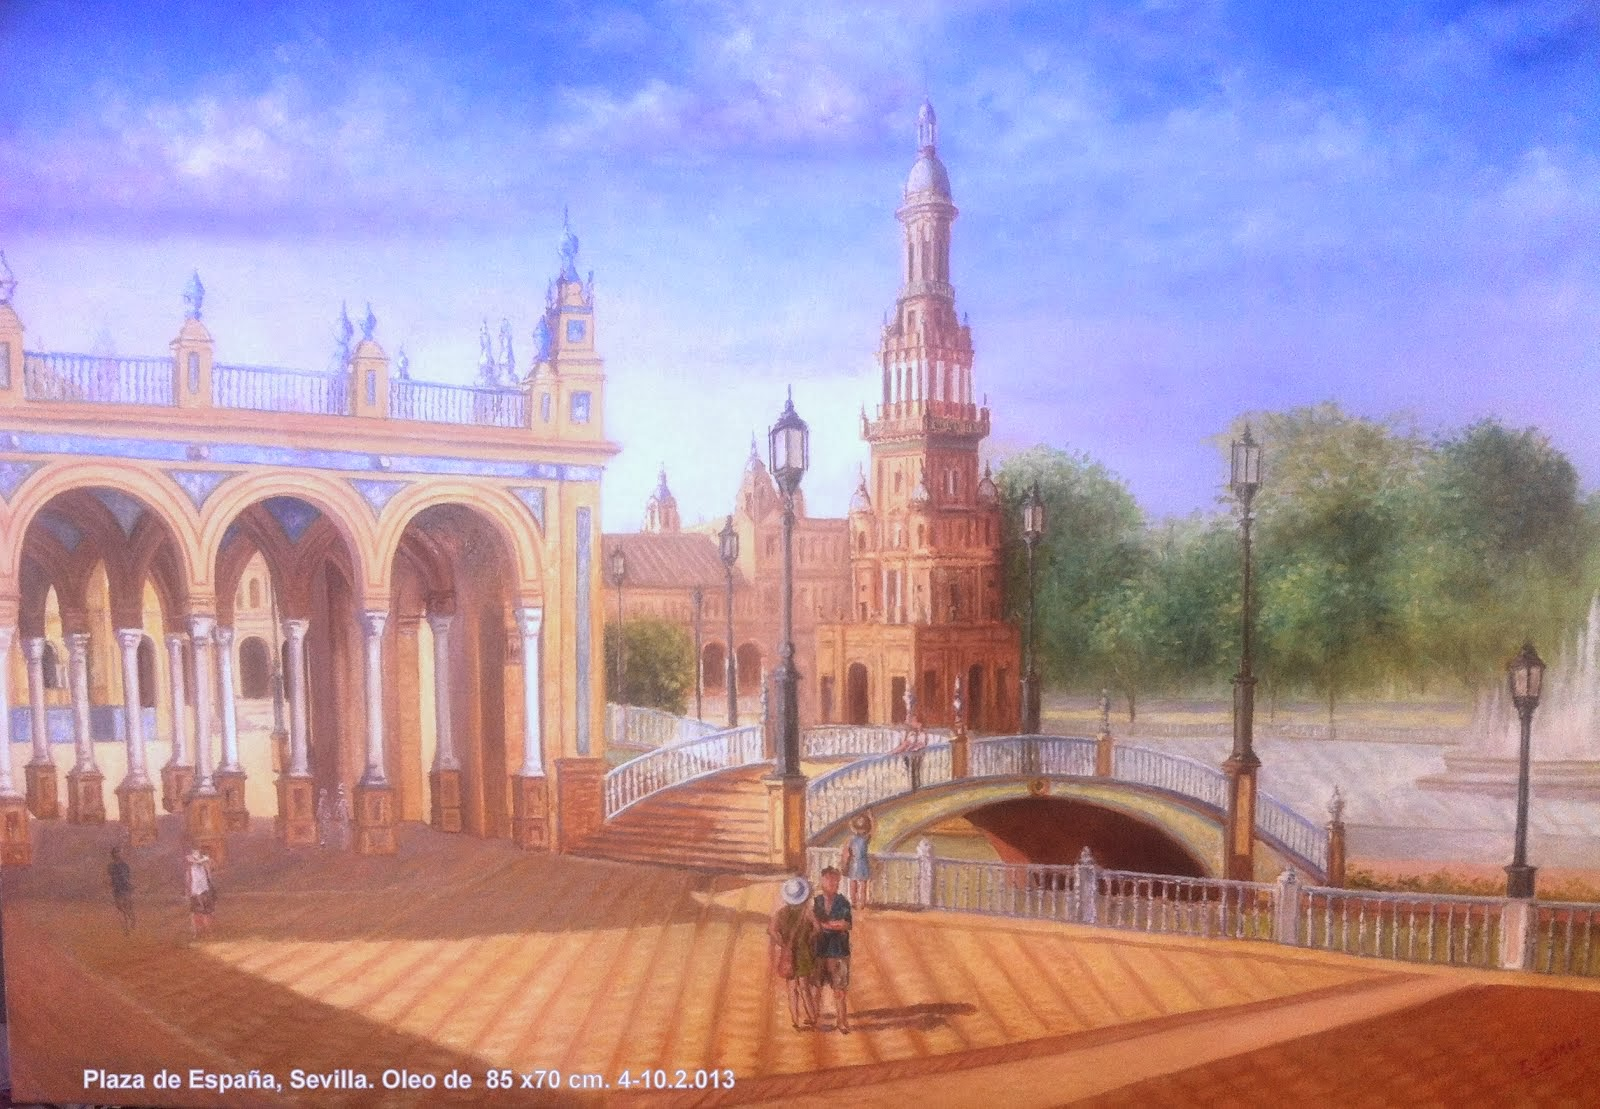 Sevilla. Vista parcial de la plaza de España